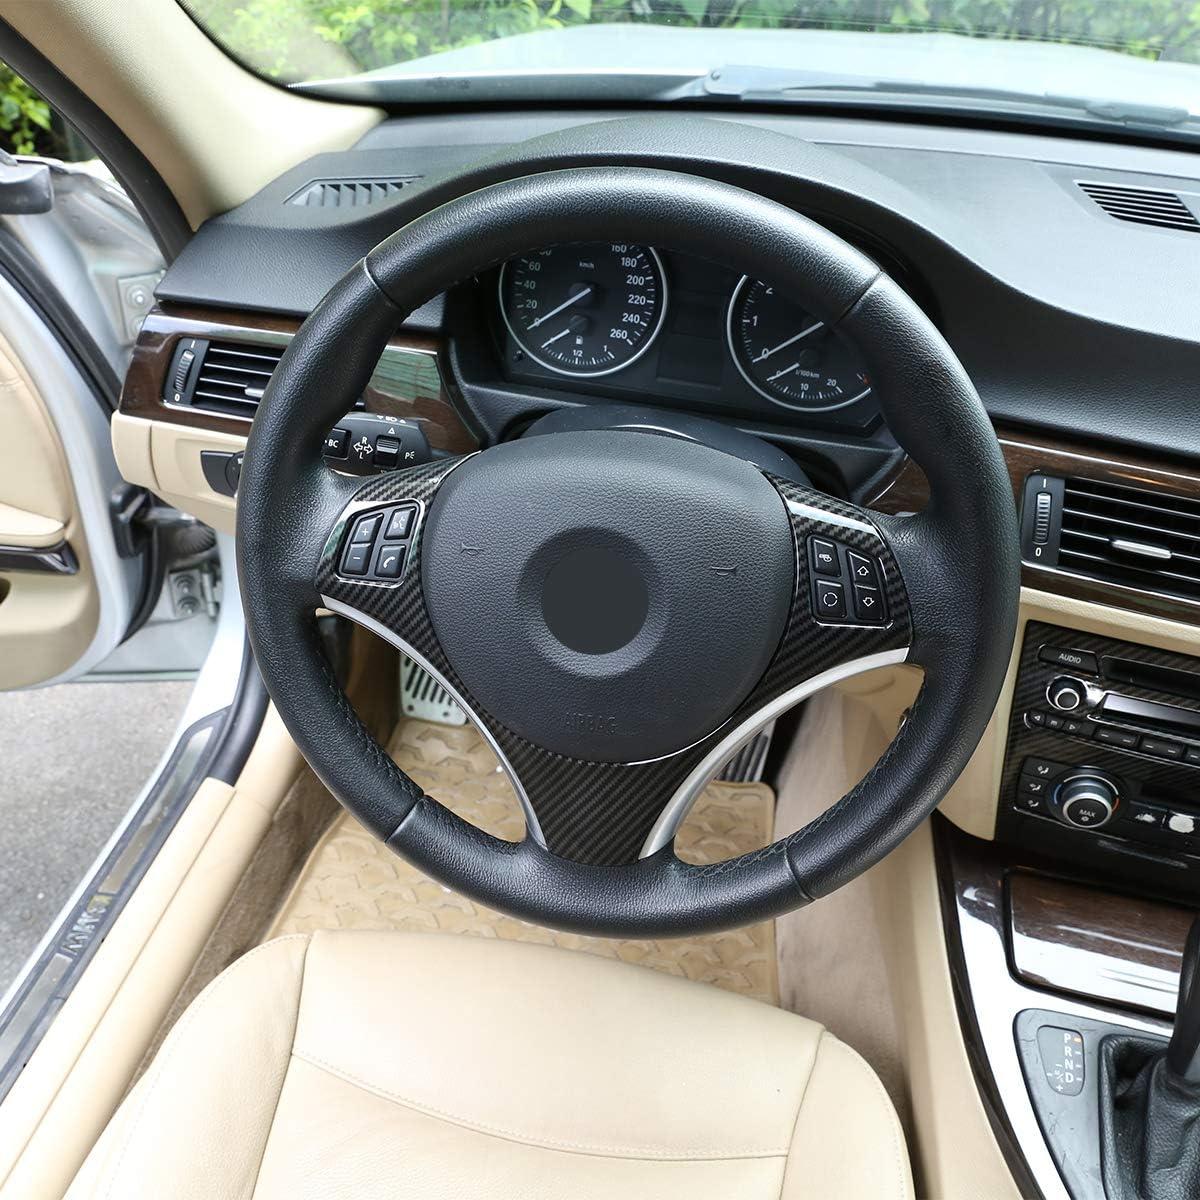 ABS Carbon Fiber Style Steering wheel sequins Frame Trim For BMW 3 Series E87 1 Series 3//5 Door Hatchback Coupe E92 E93 E90 2004-2012